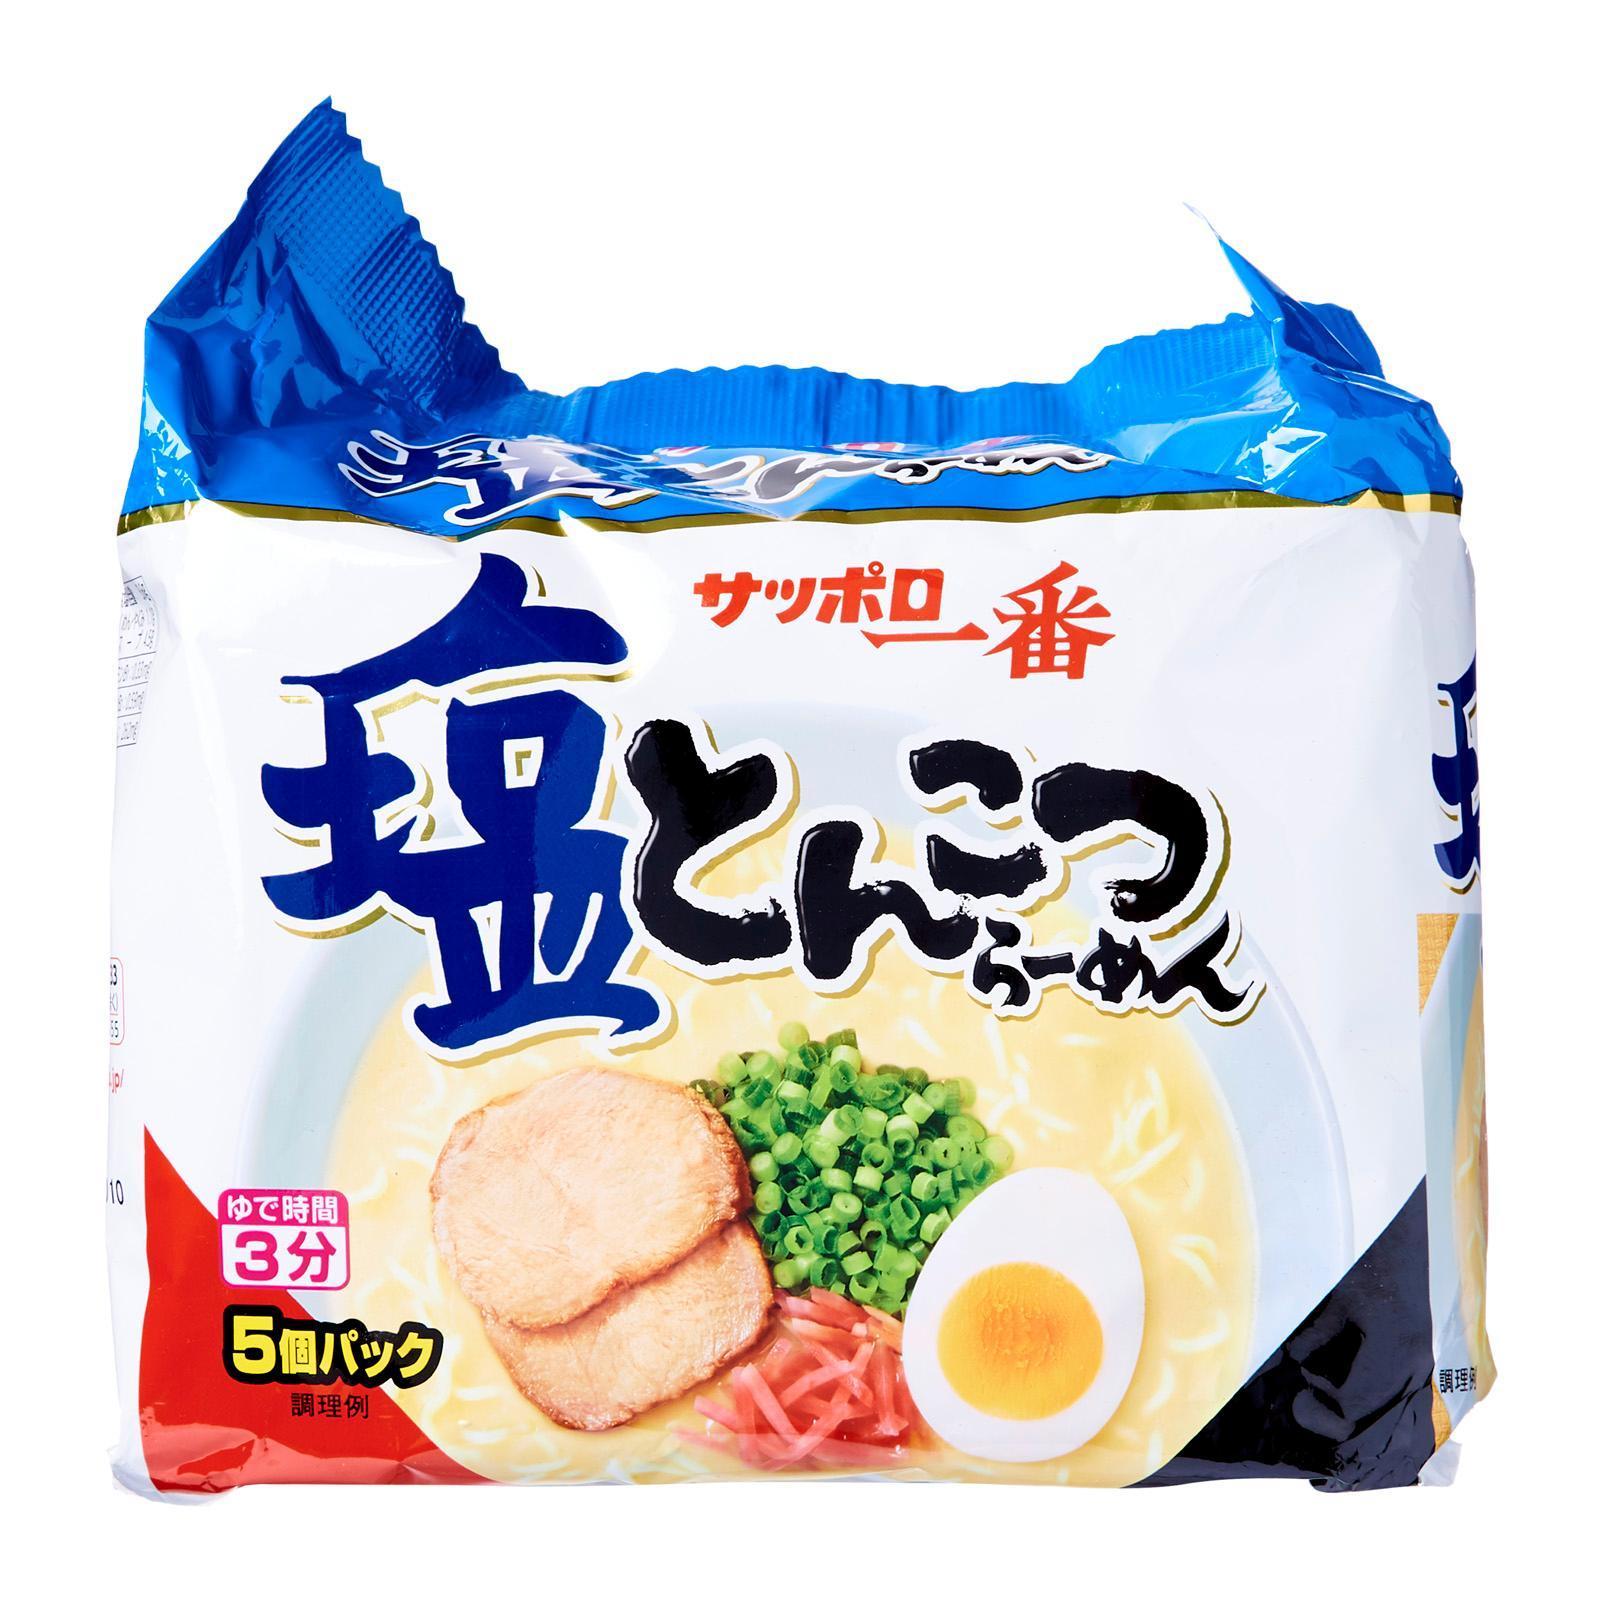 Sapporo Ichiban Salt Porkbone Broth Shio Tonkotsu Instant Ramen Noodles